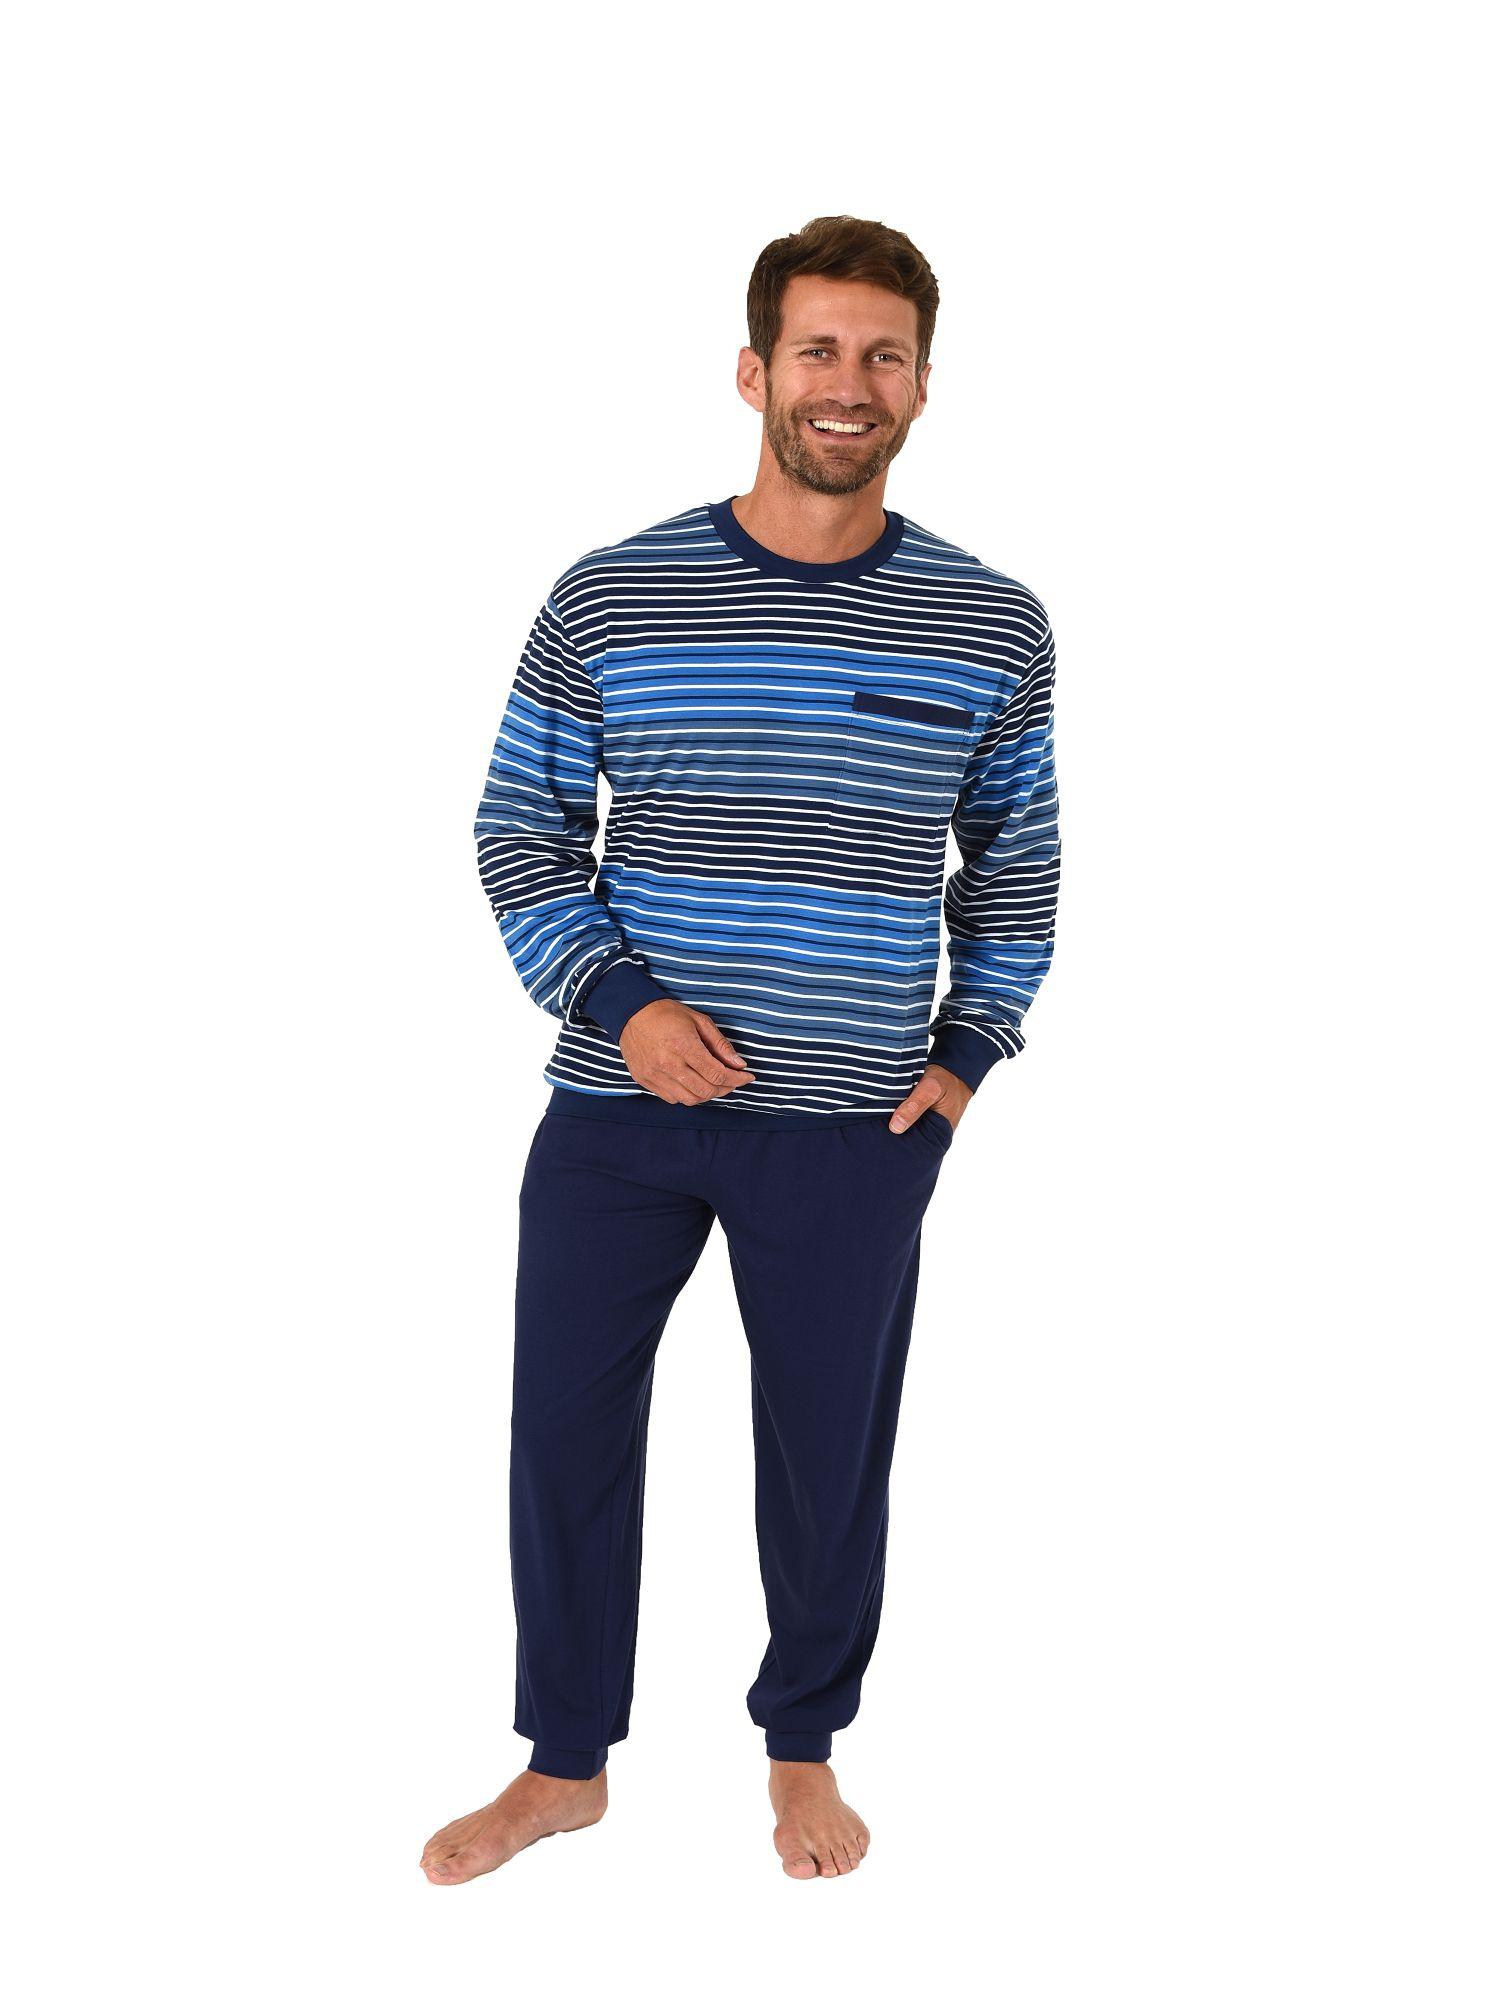 92c10bccb27768 Herren Pyjama Schlafanzug mit Bündchen langarm in edler Streifenoptik 101  90 538